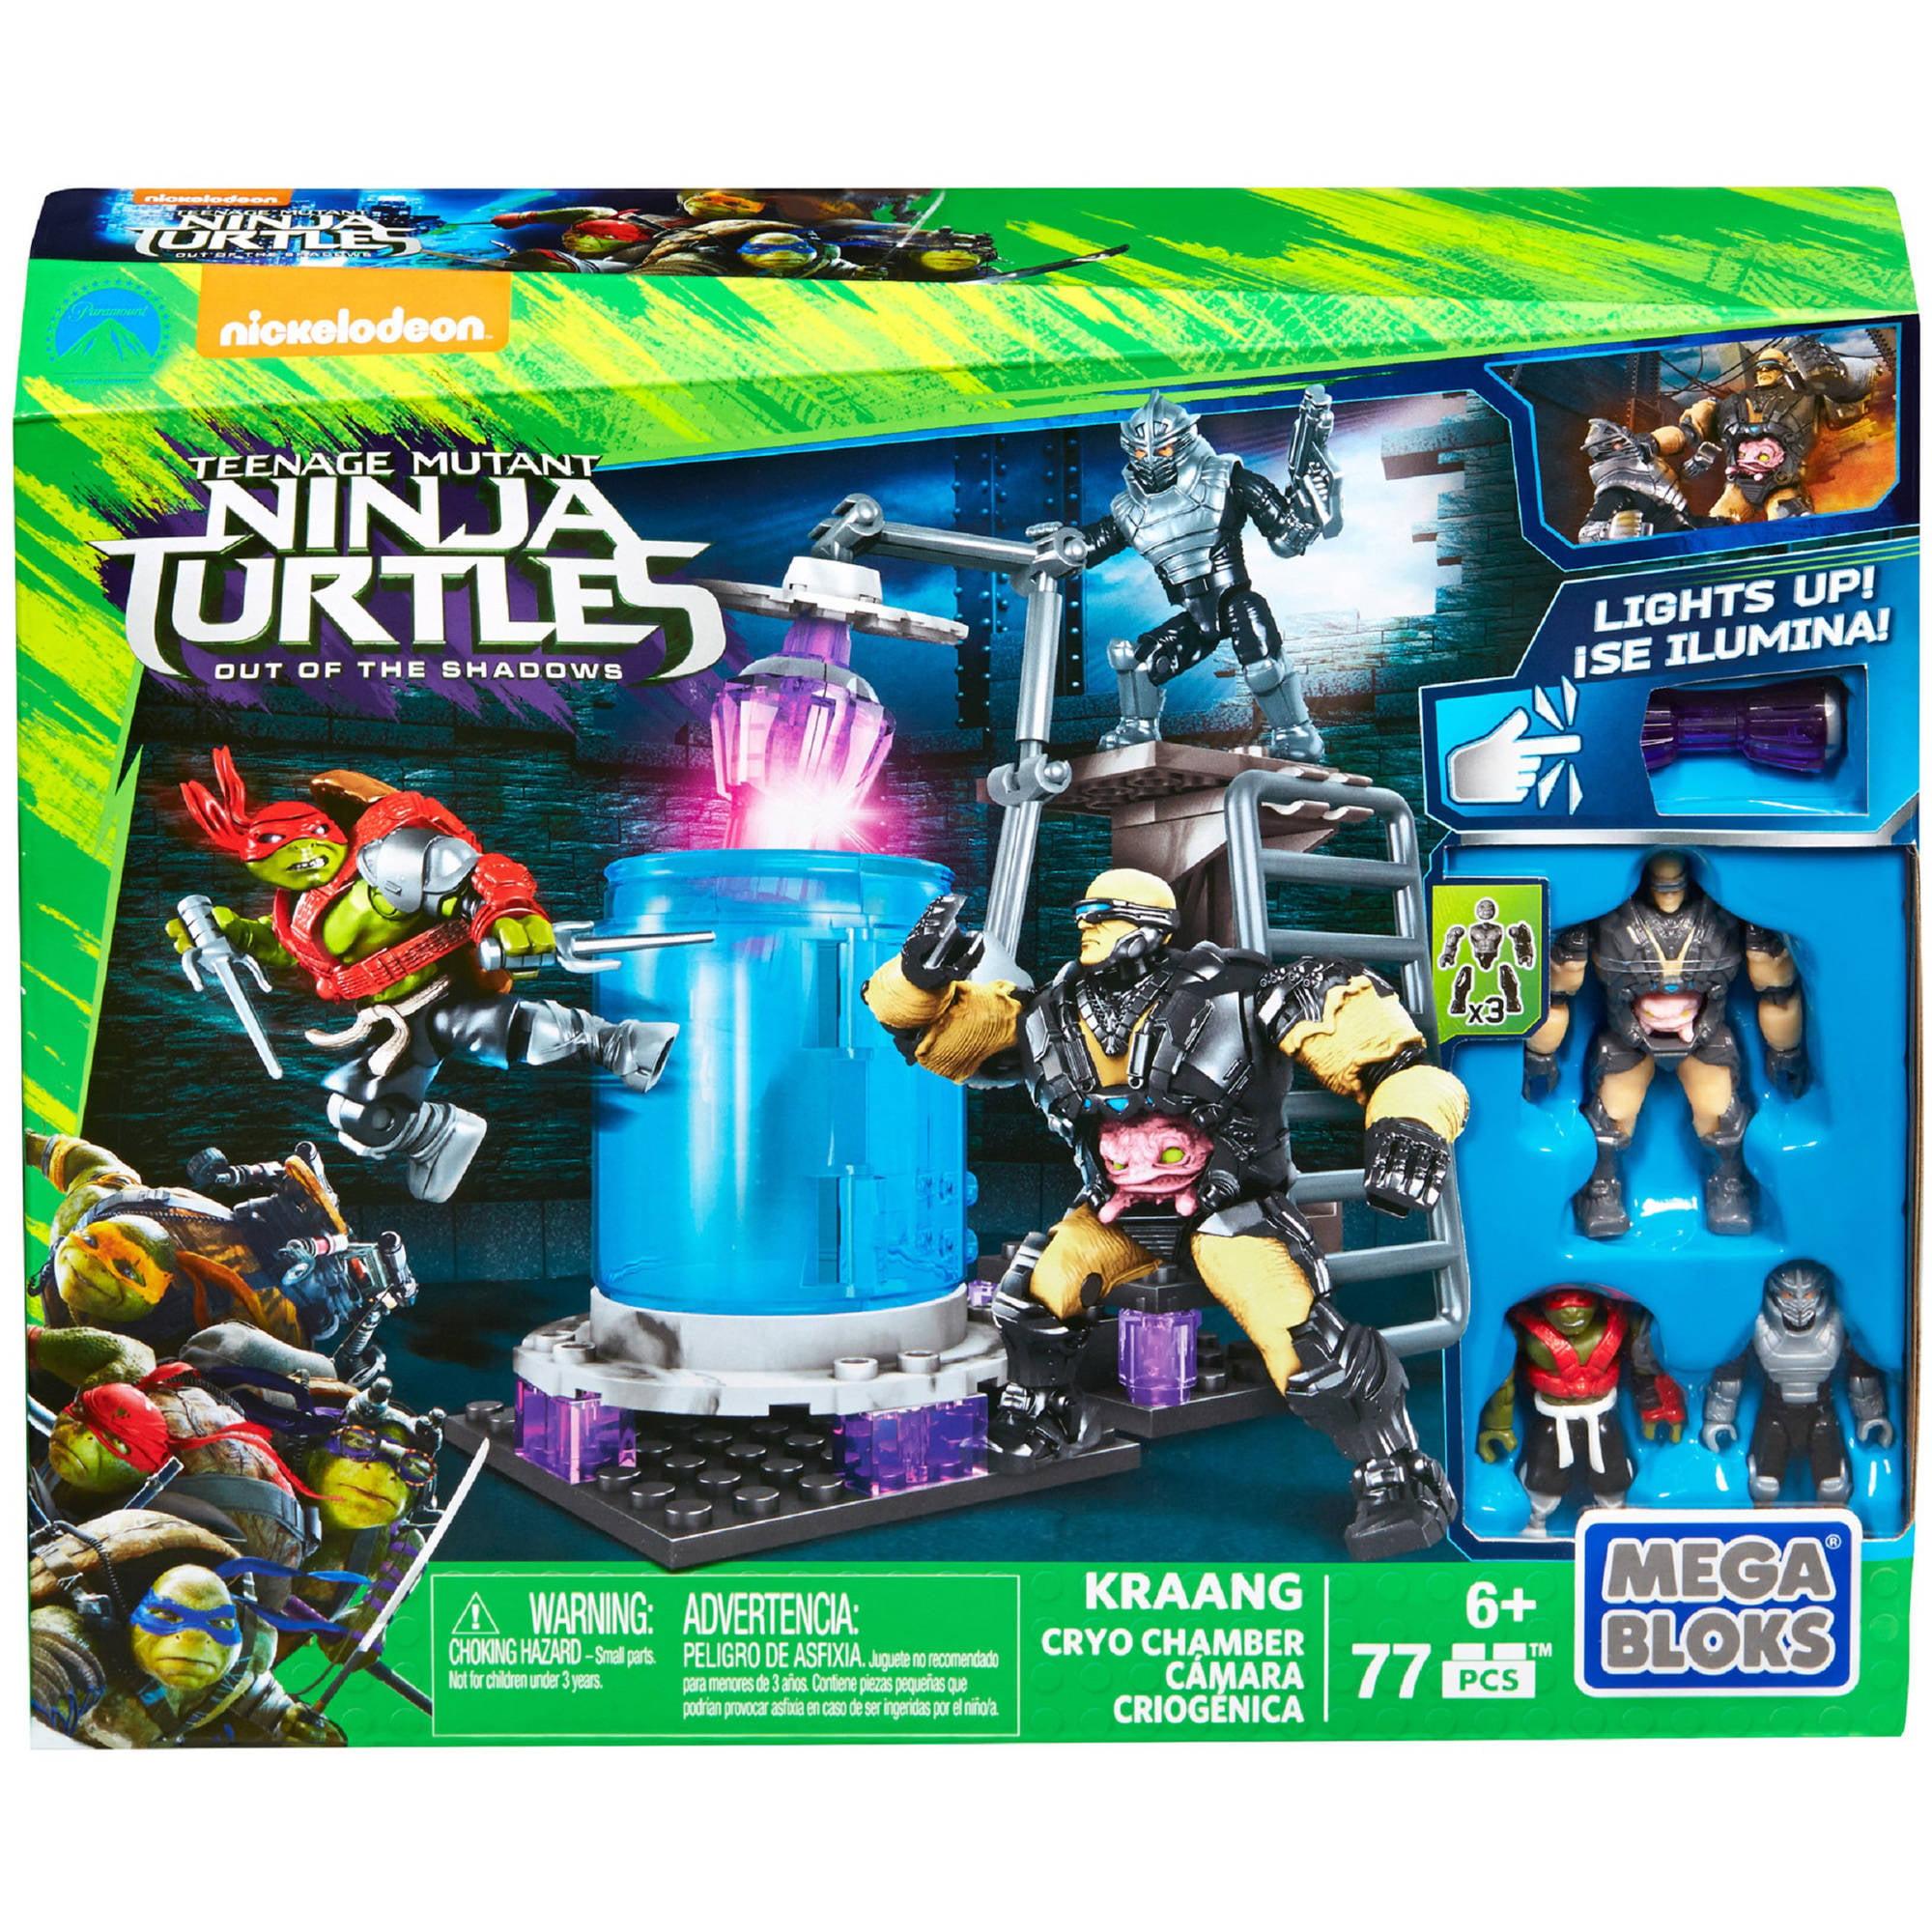 Mega Bloks Teenage Mutant Ninja Turtles Kraang Cryo Chamber DRK00